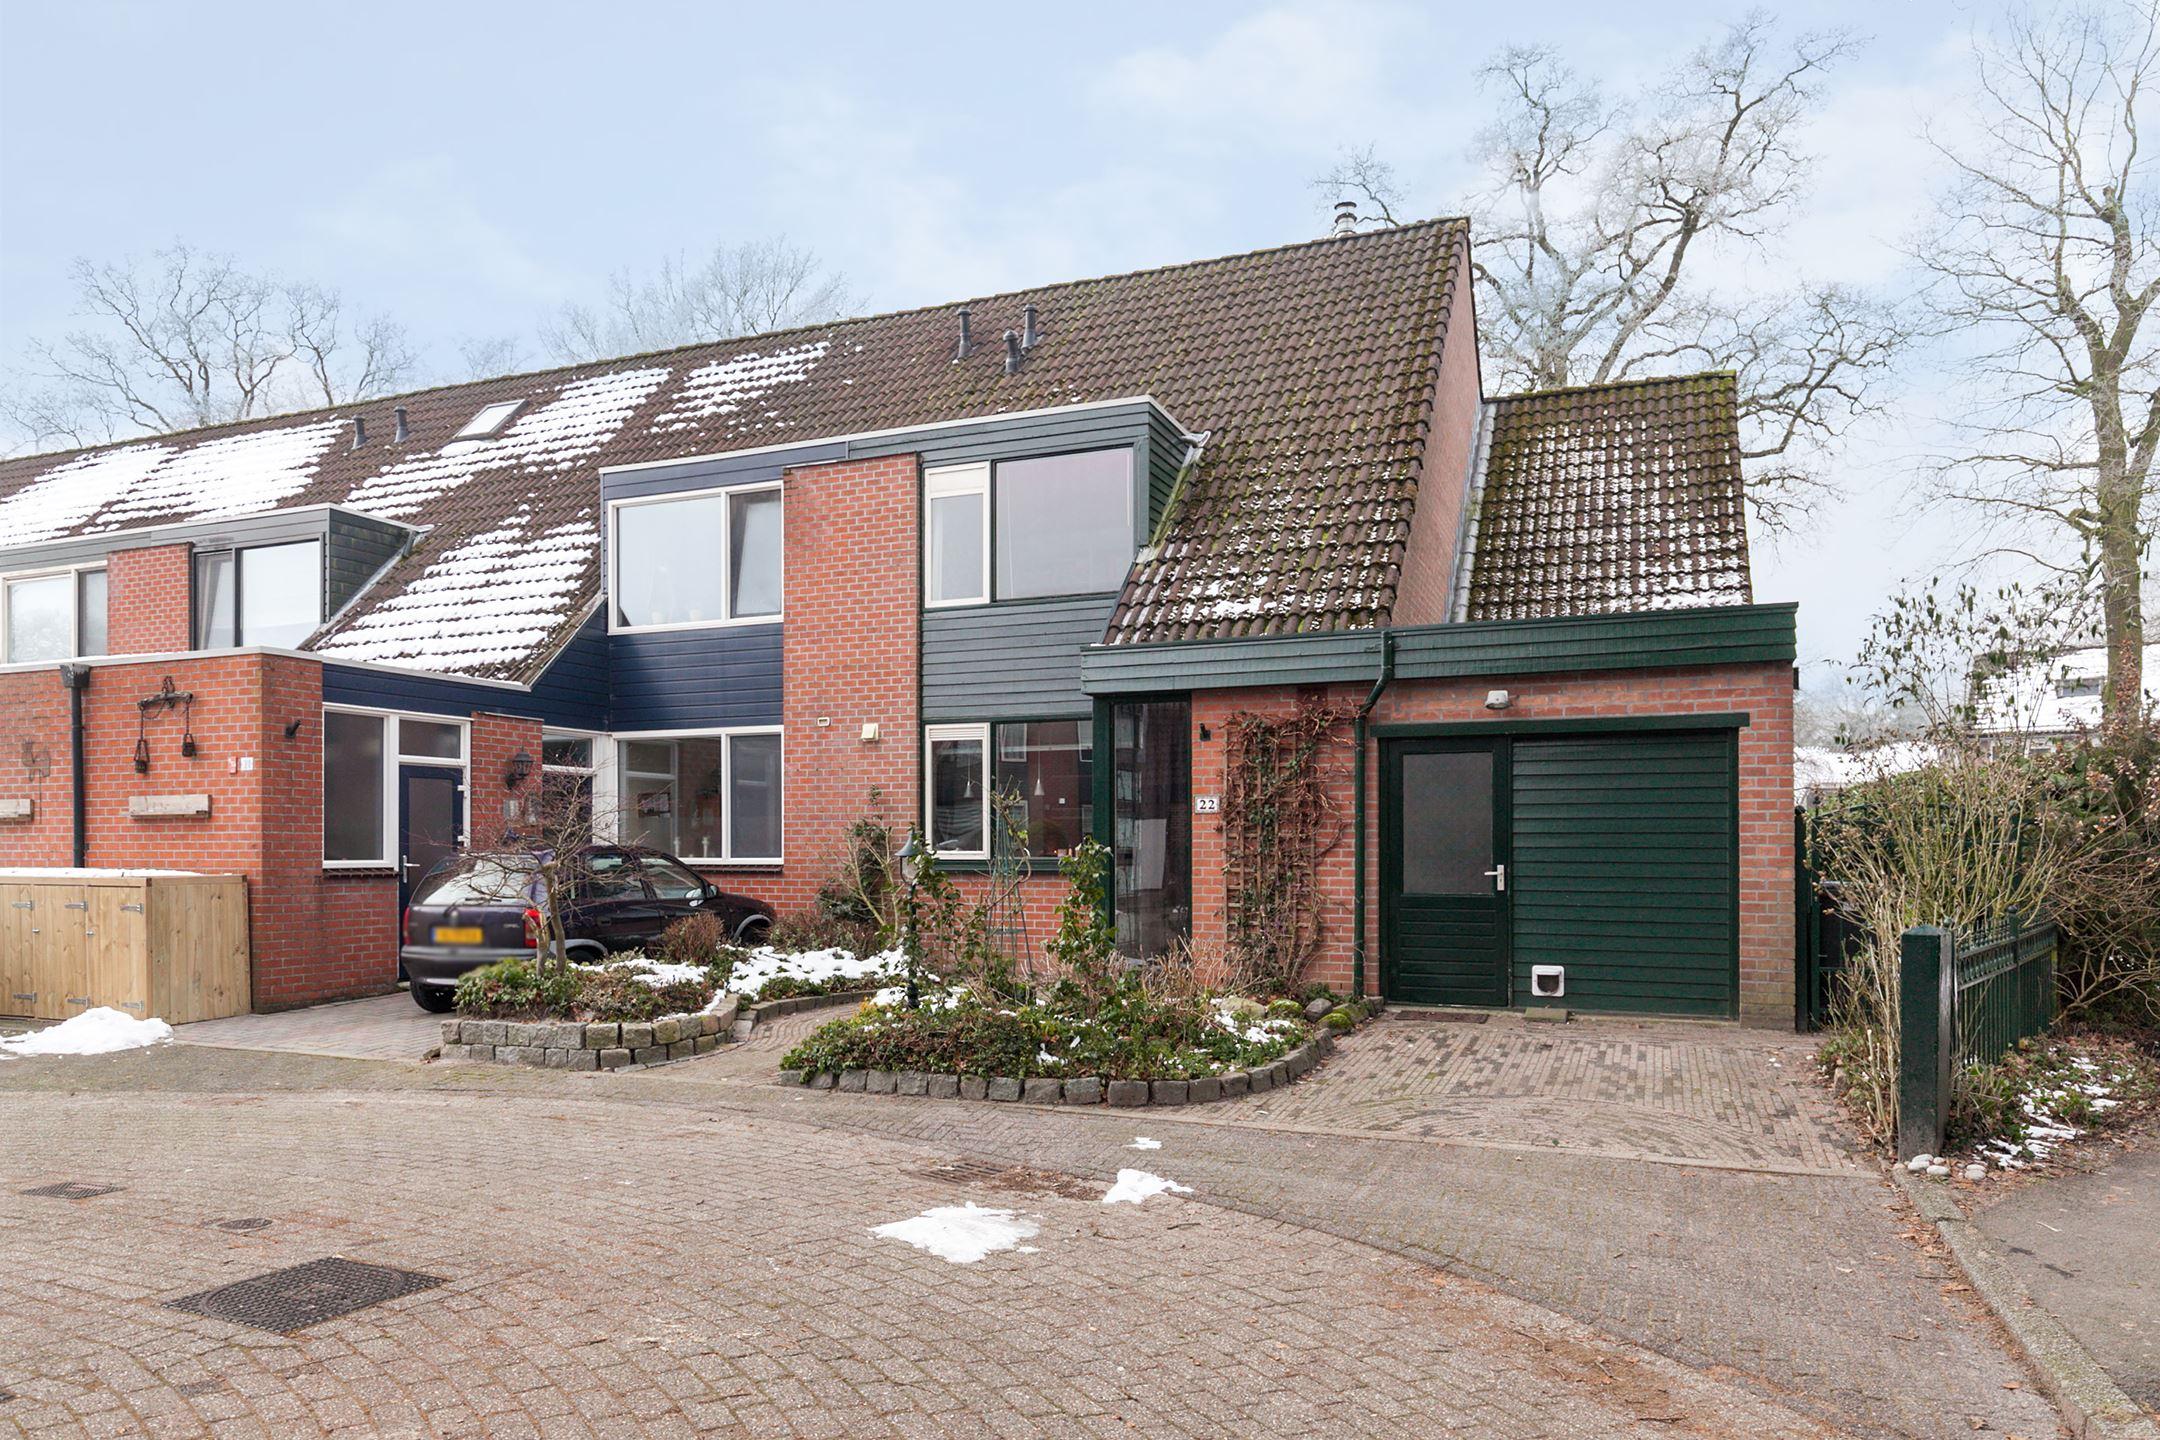 Huis te koop: Venderinklanden 22 7542 MK Enschede [funda]